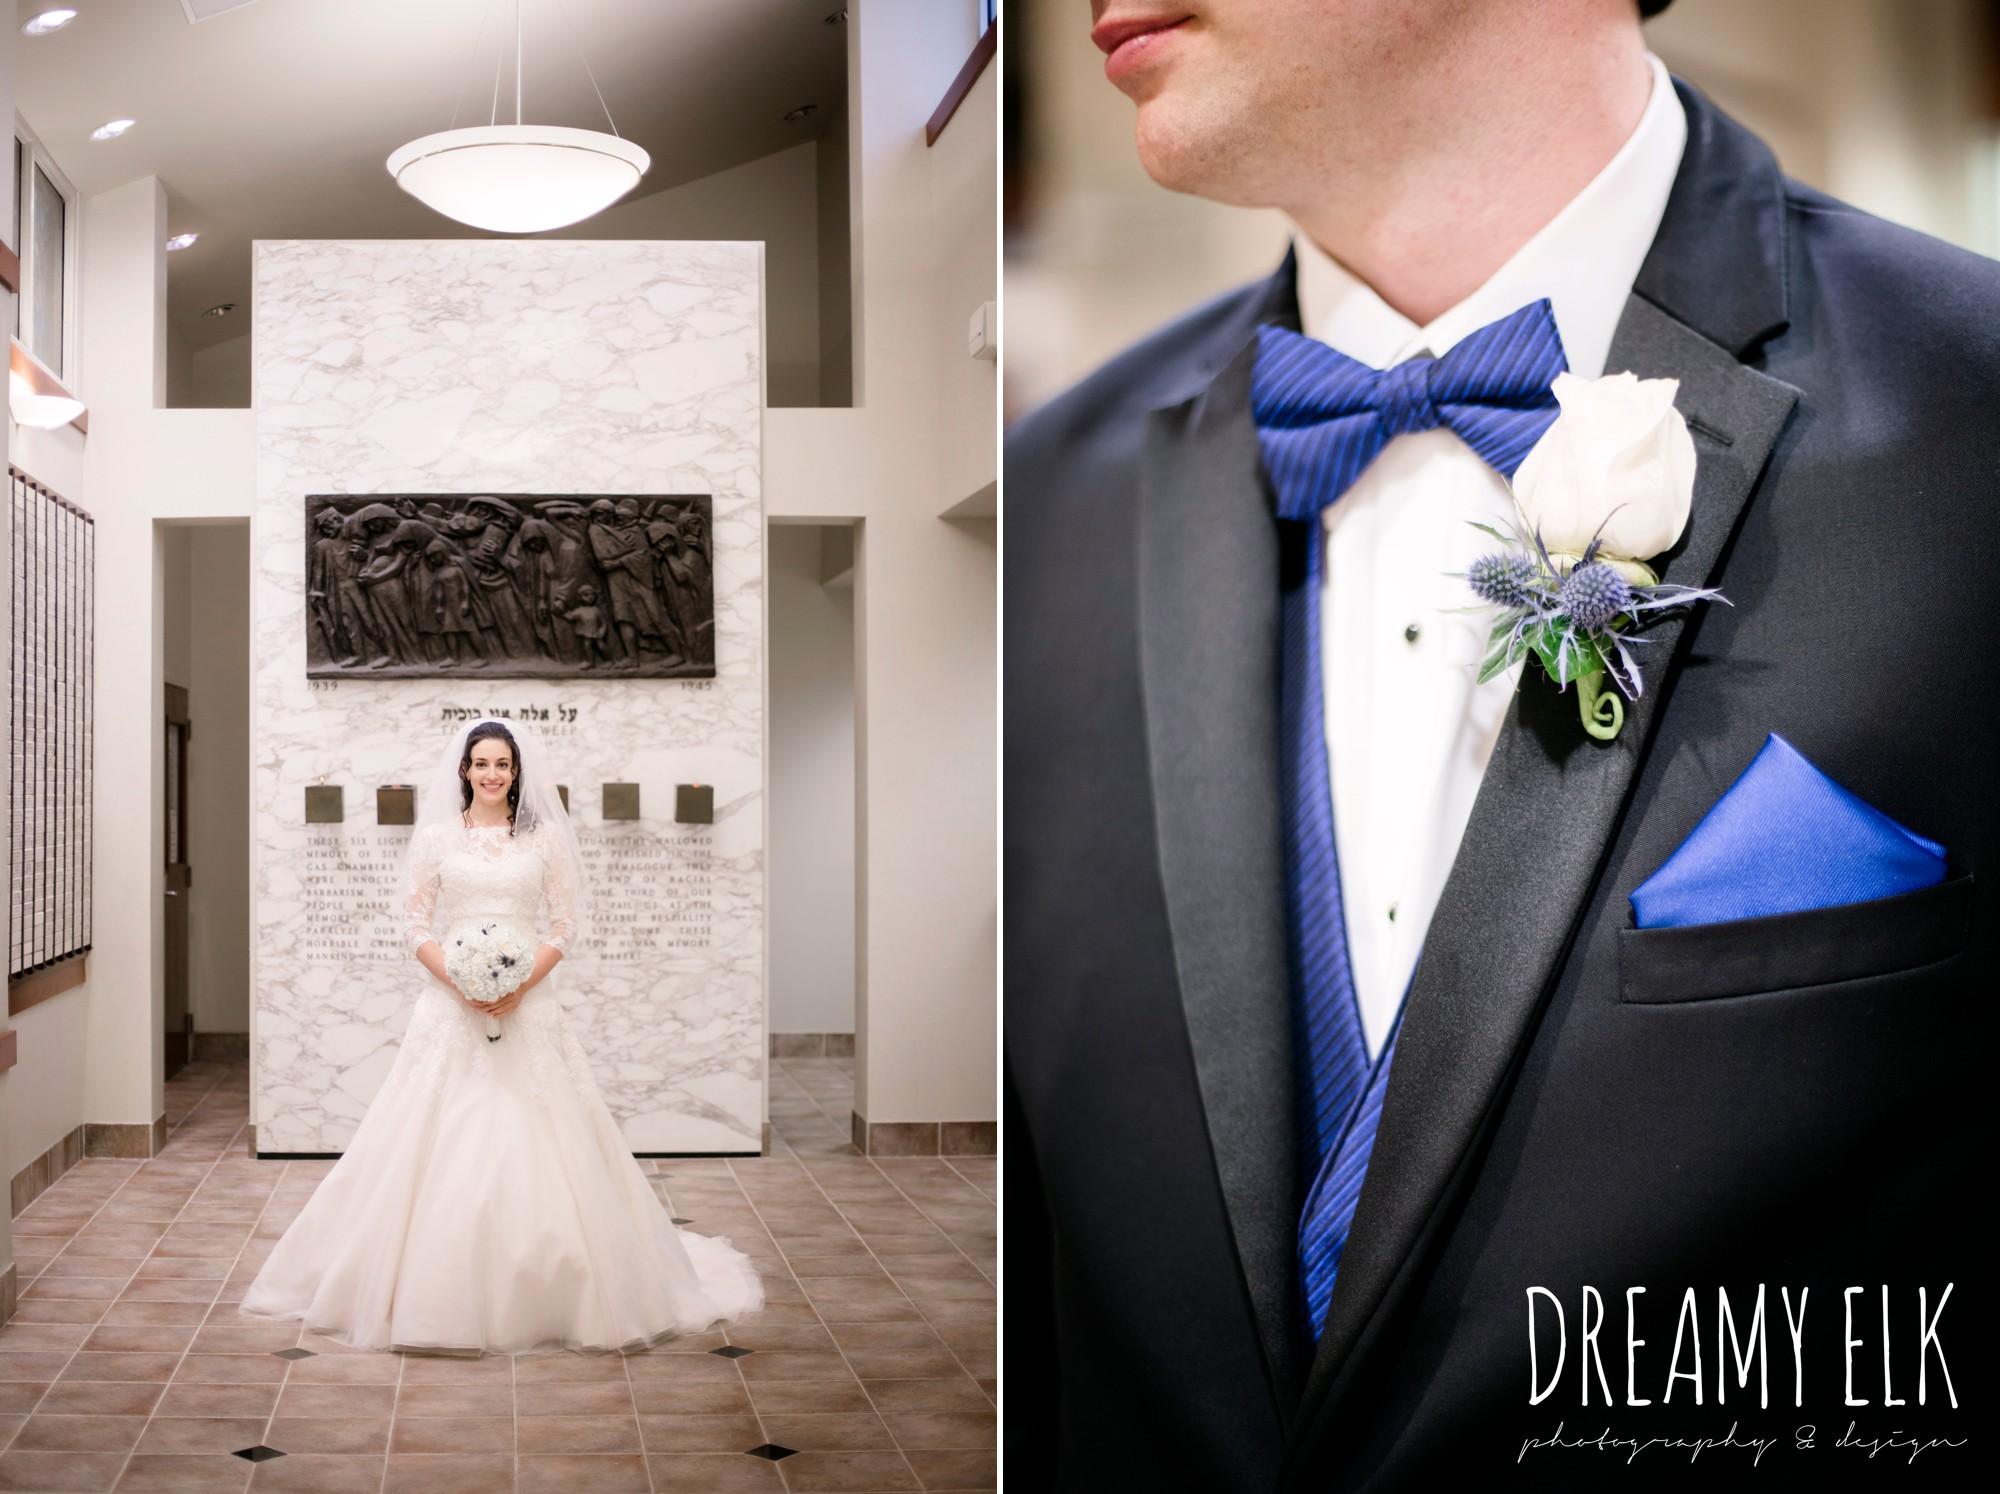 bride, essence of australia wedding dress, groom, michael kors suit, jewish wedding ceremony, summer june jewish wedding photo {dreamy elk photography and design}